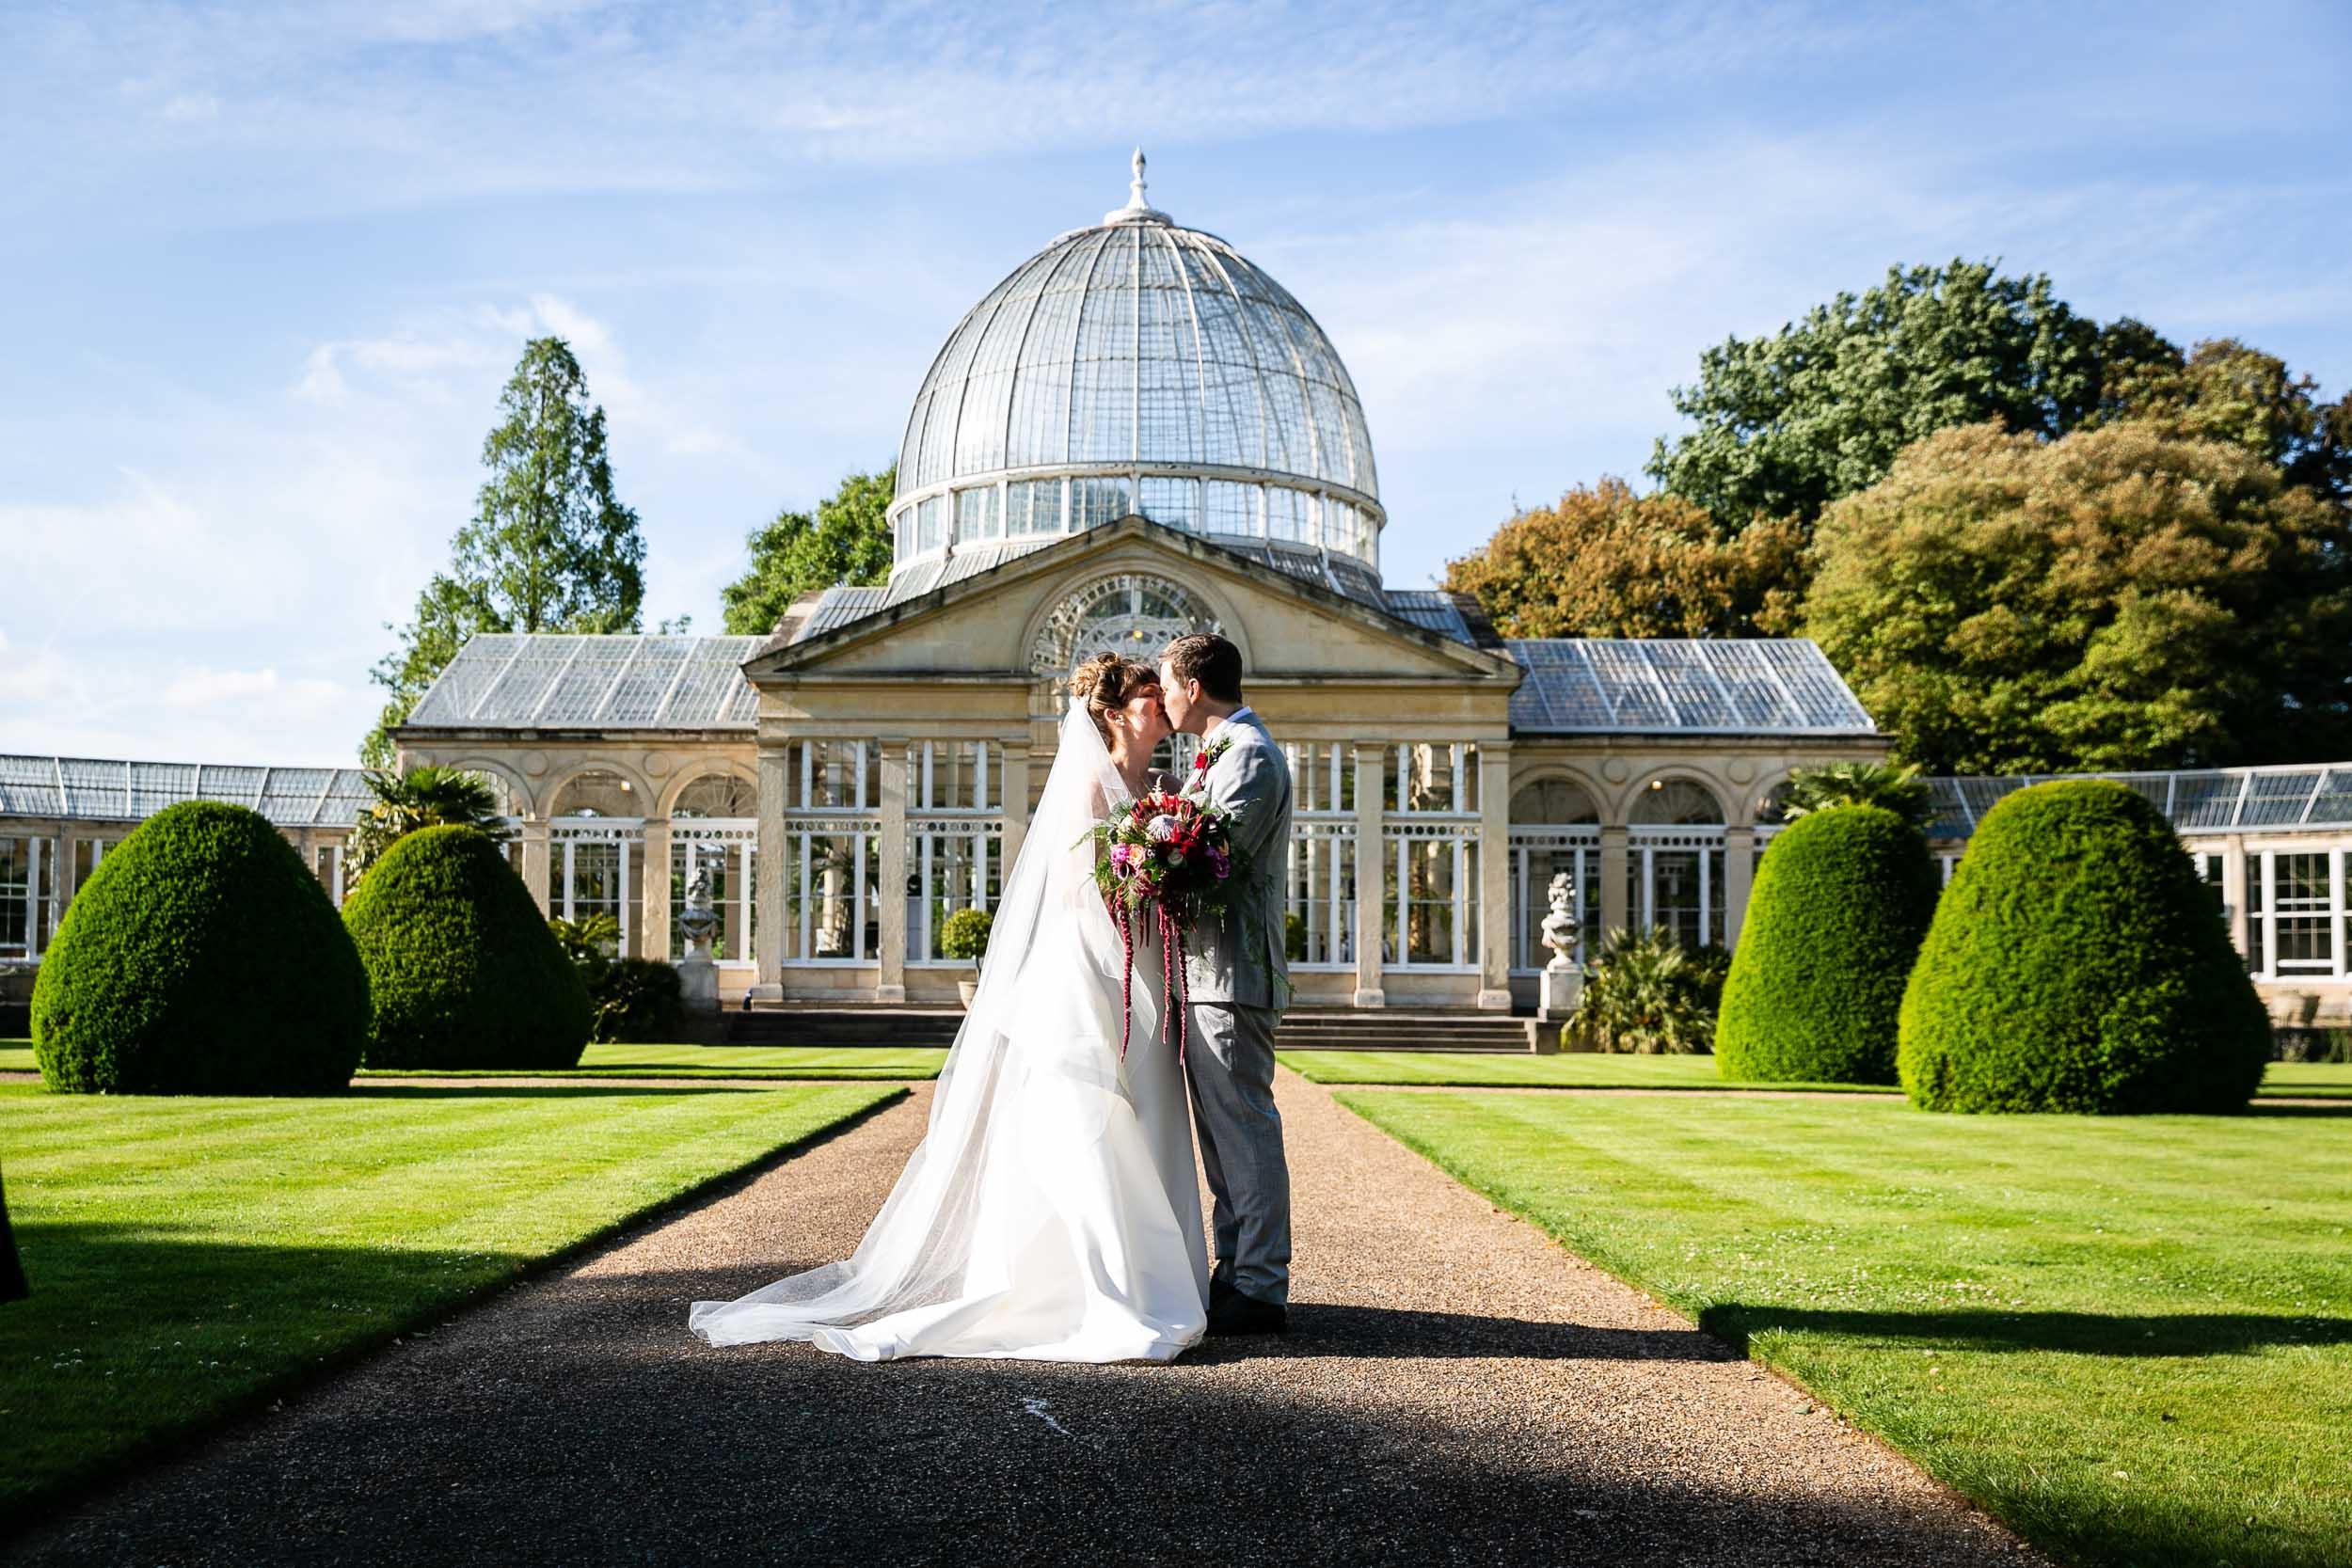 syon-house-wedding-photographer-london 106.jpg